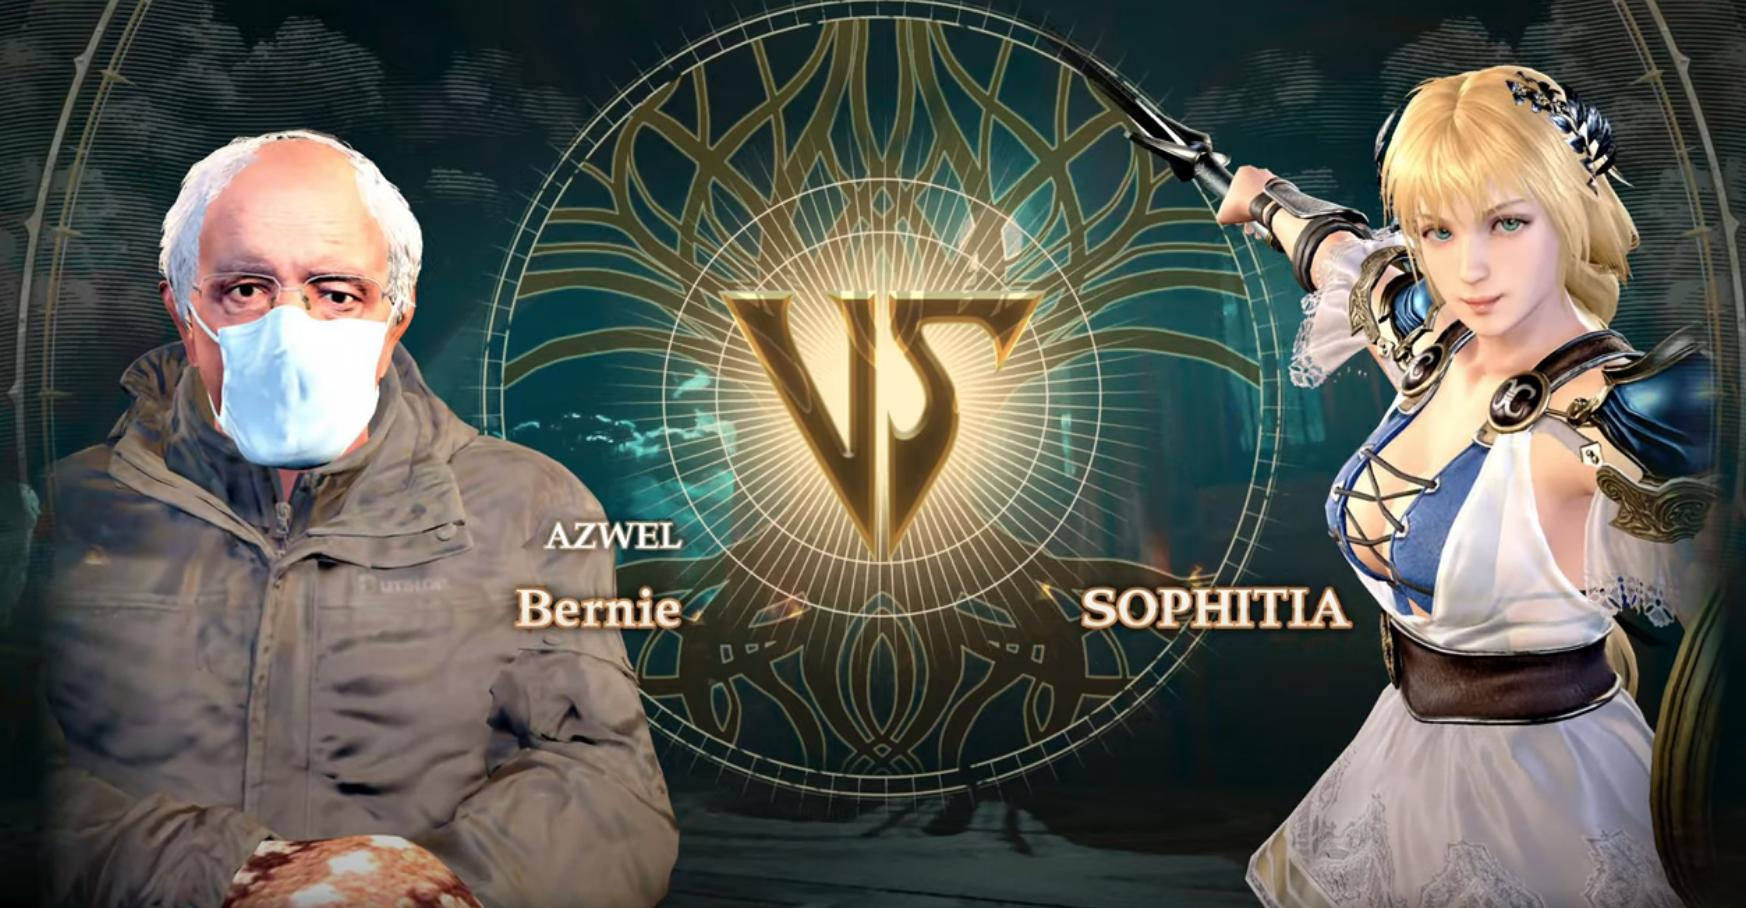 Play As Bernie Sanders Inaugural Meme In Soul Caliber 6 Jioforme